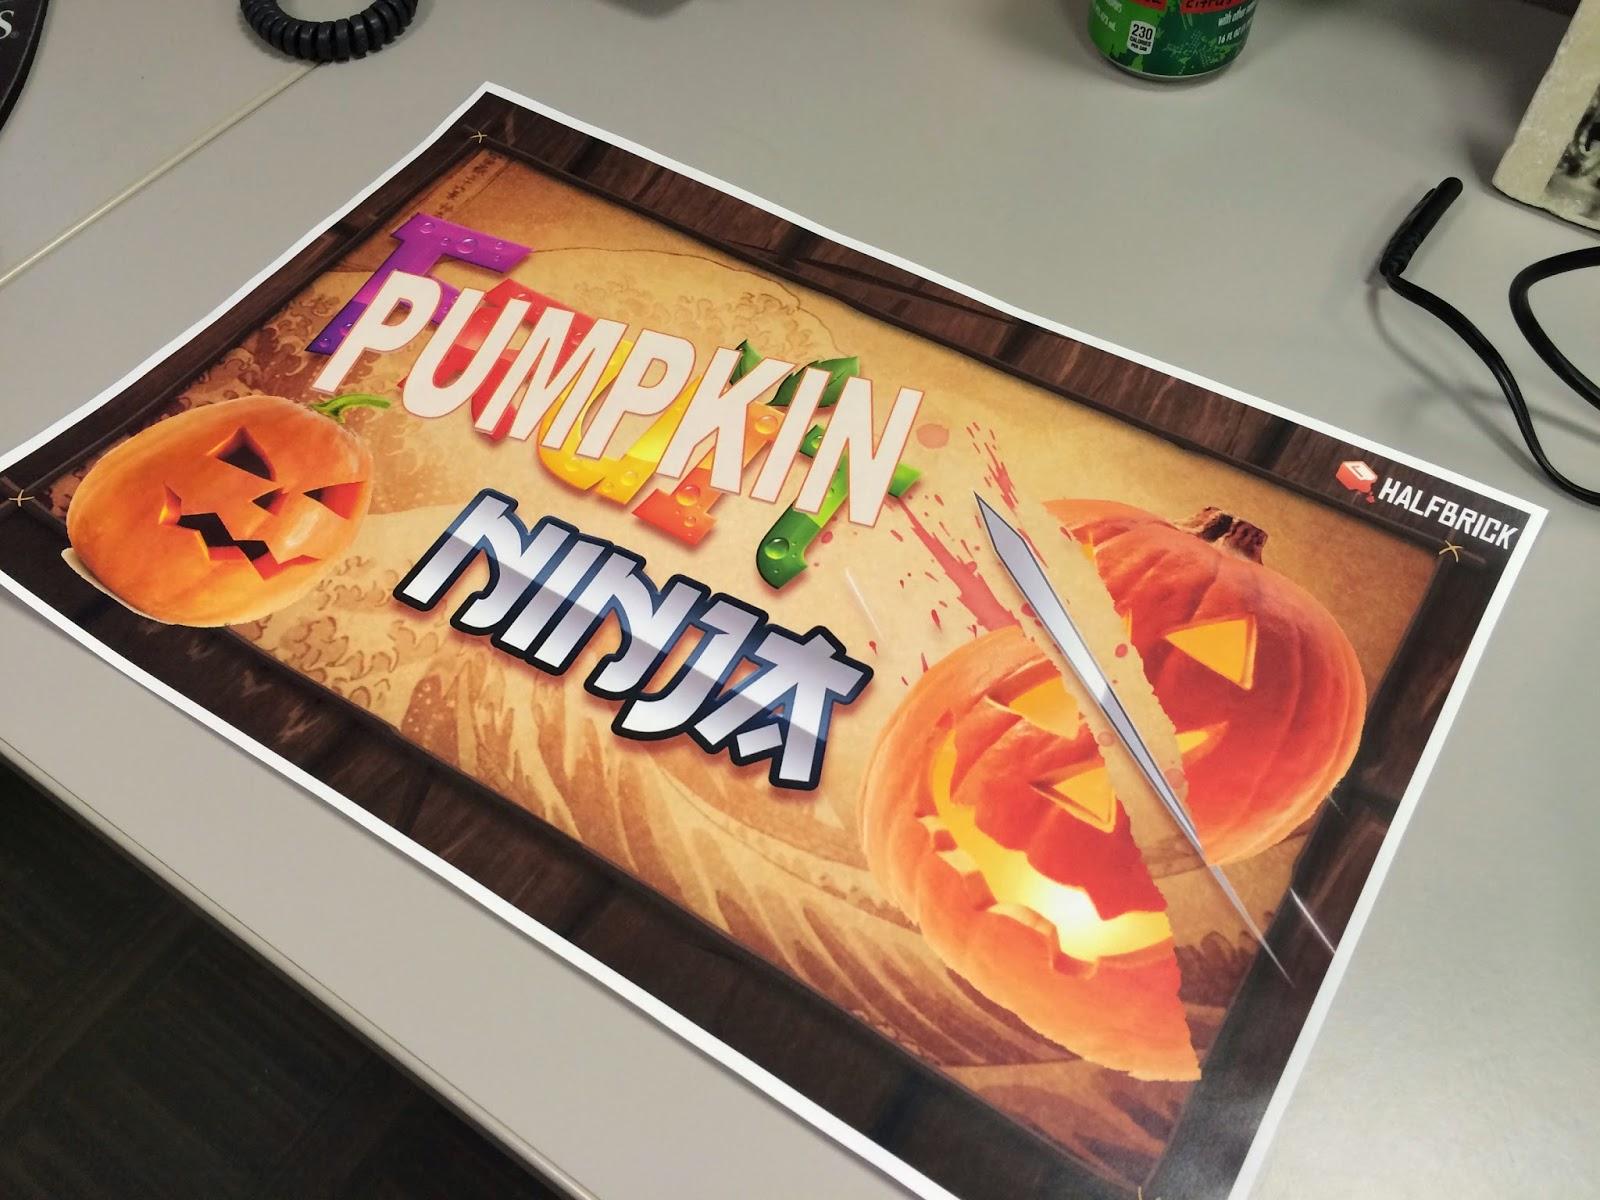 Dad-Geek-Gamer: In That Order: Fruit Ninja: Cub Scout Pumpkin Edition